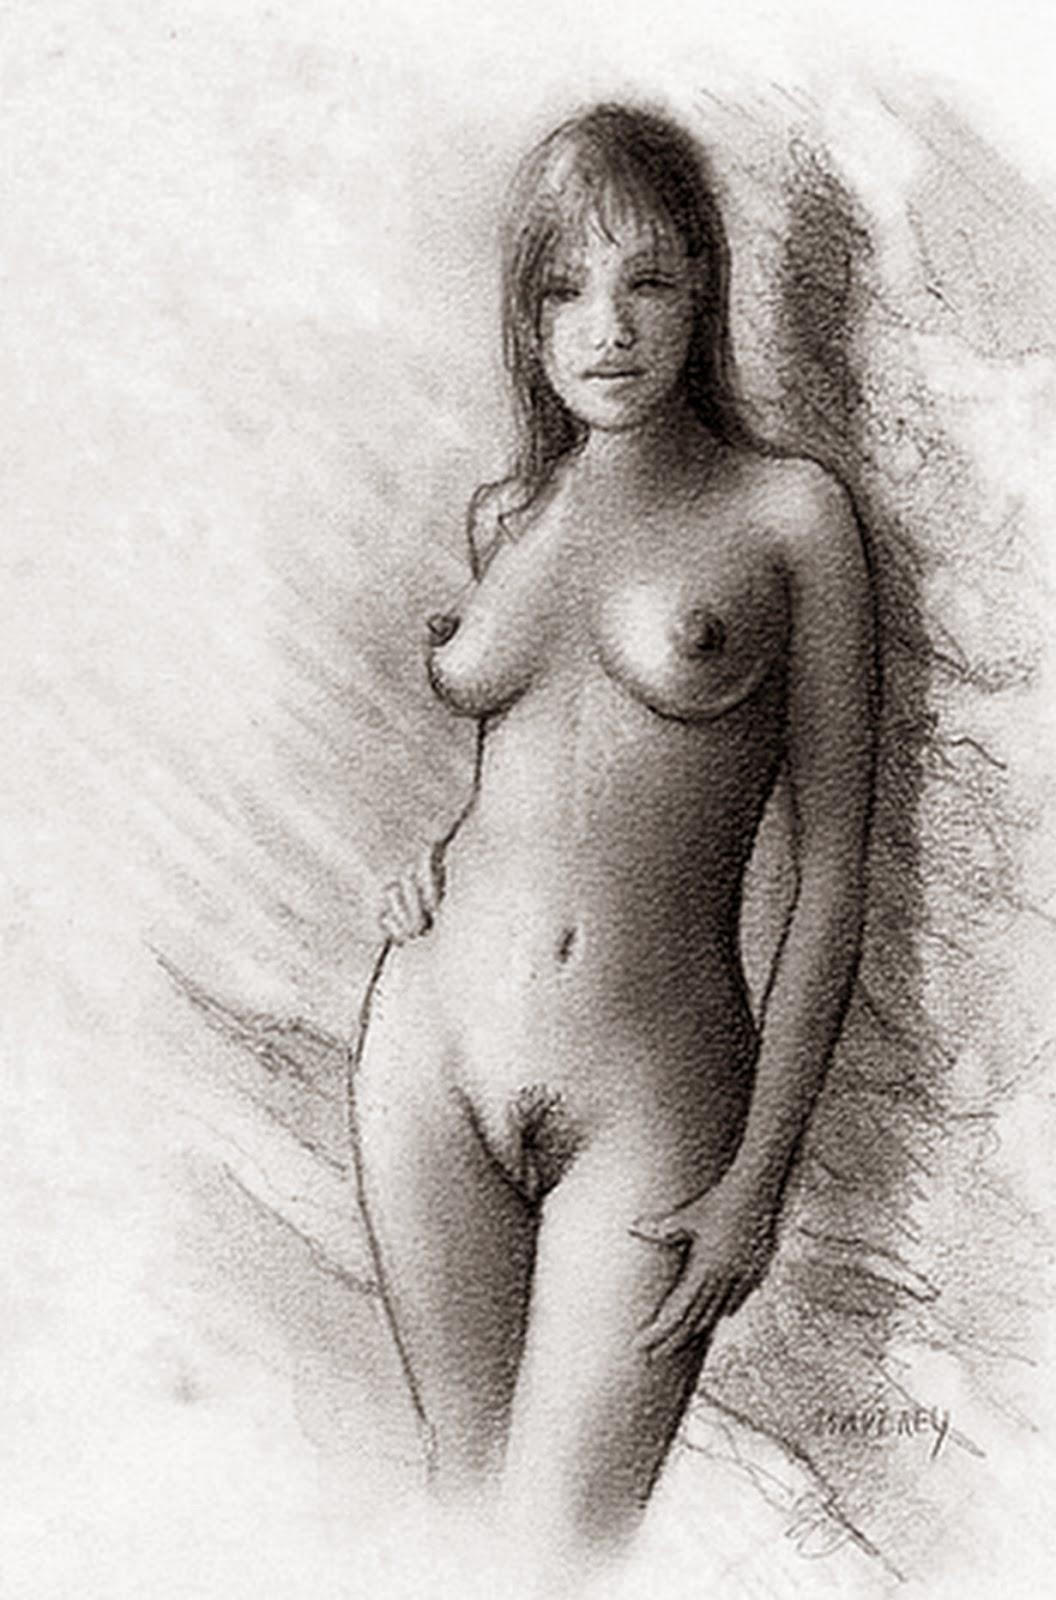 Desnudo mayores figura completa mujeres